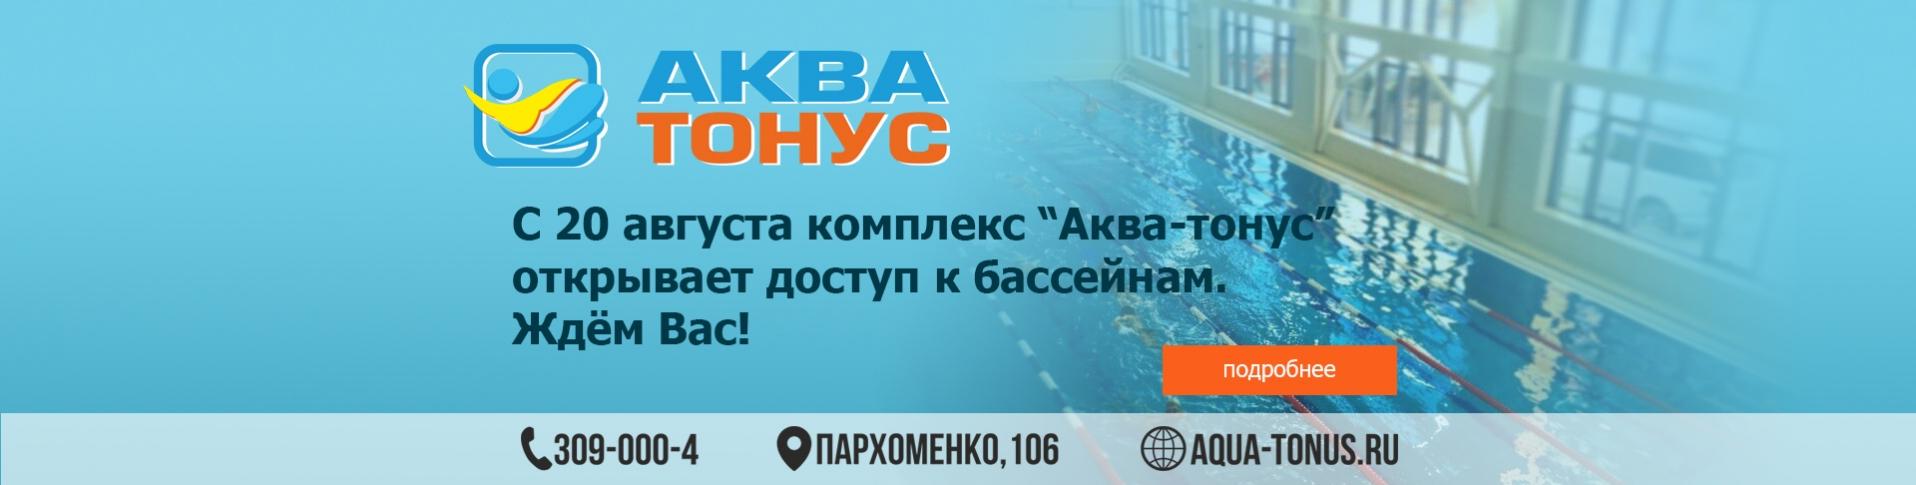 https://www.aqua-tonus.ru/events/vnimanie-s-20-avgusta-kompleks-vnov-otkryvaet-dveri